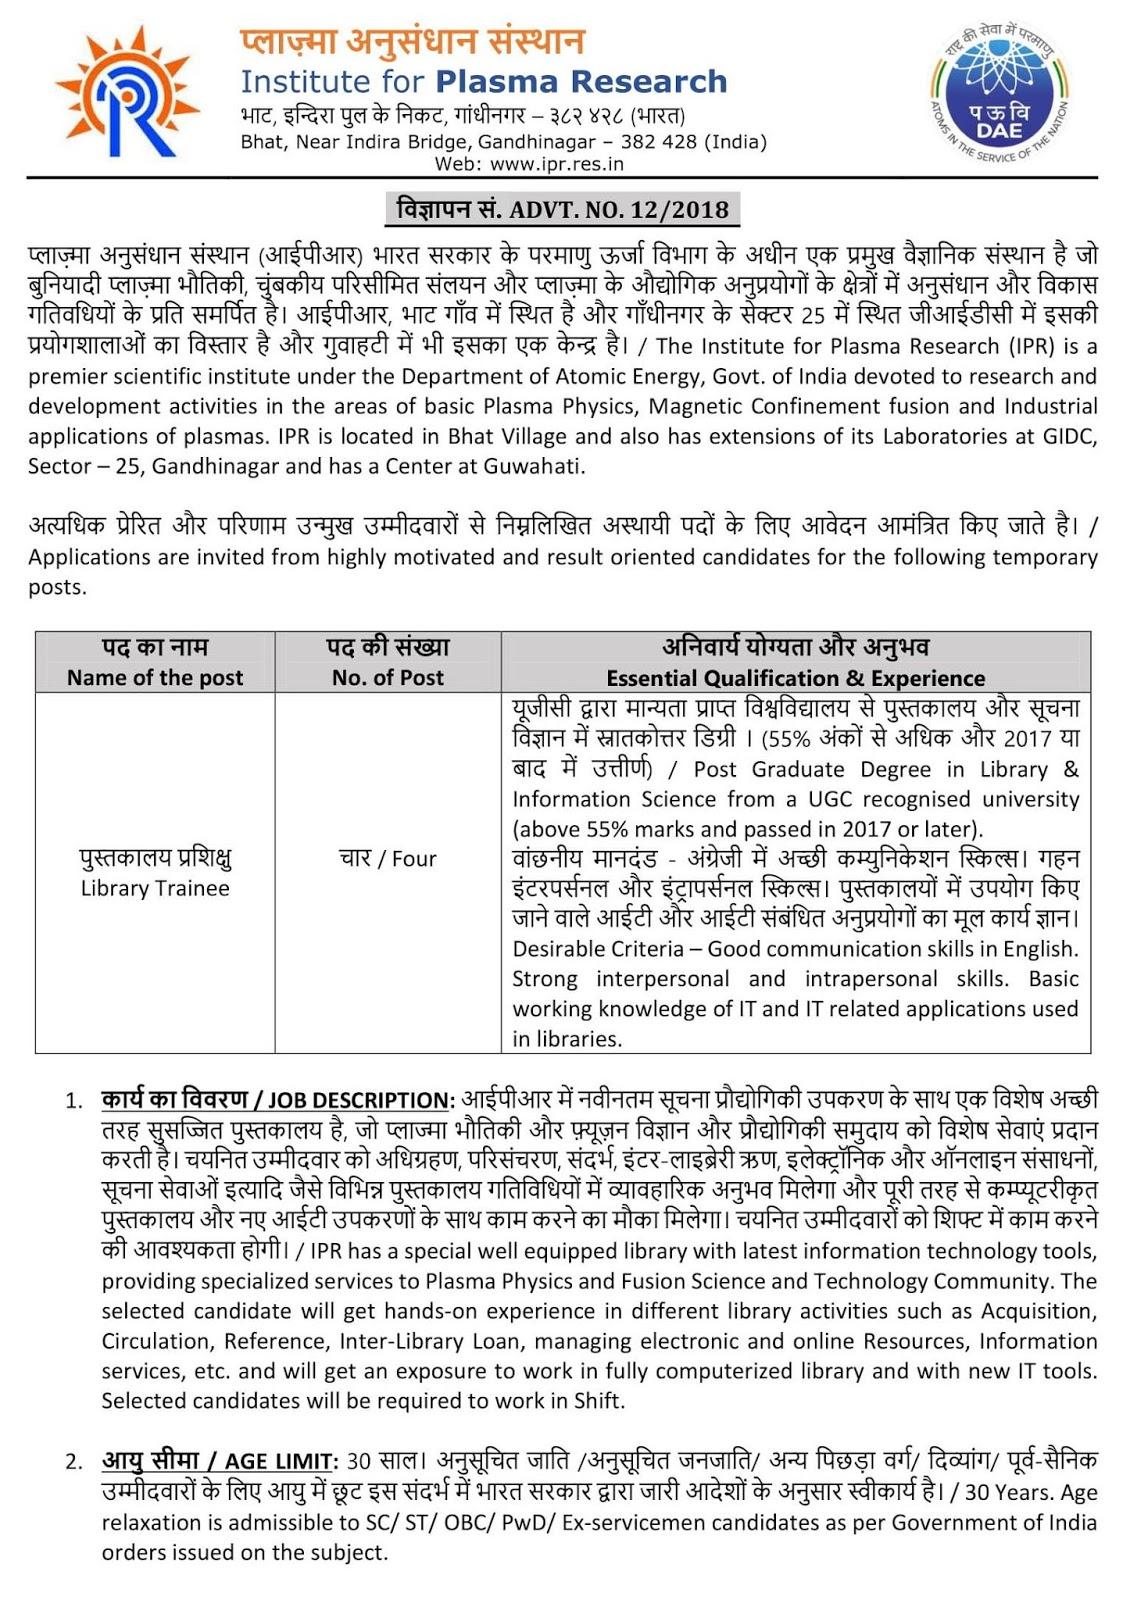 dating steder i gandhinagar download dating agentur cyrano ep 11